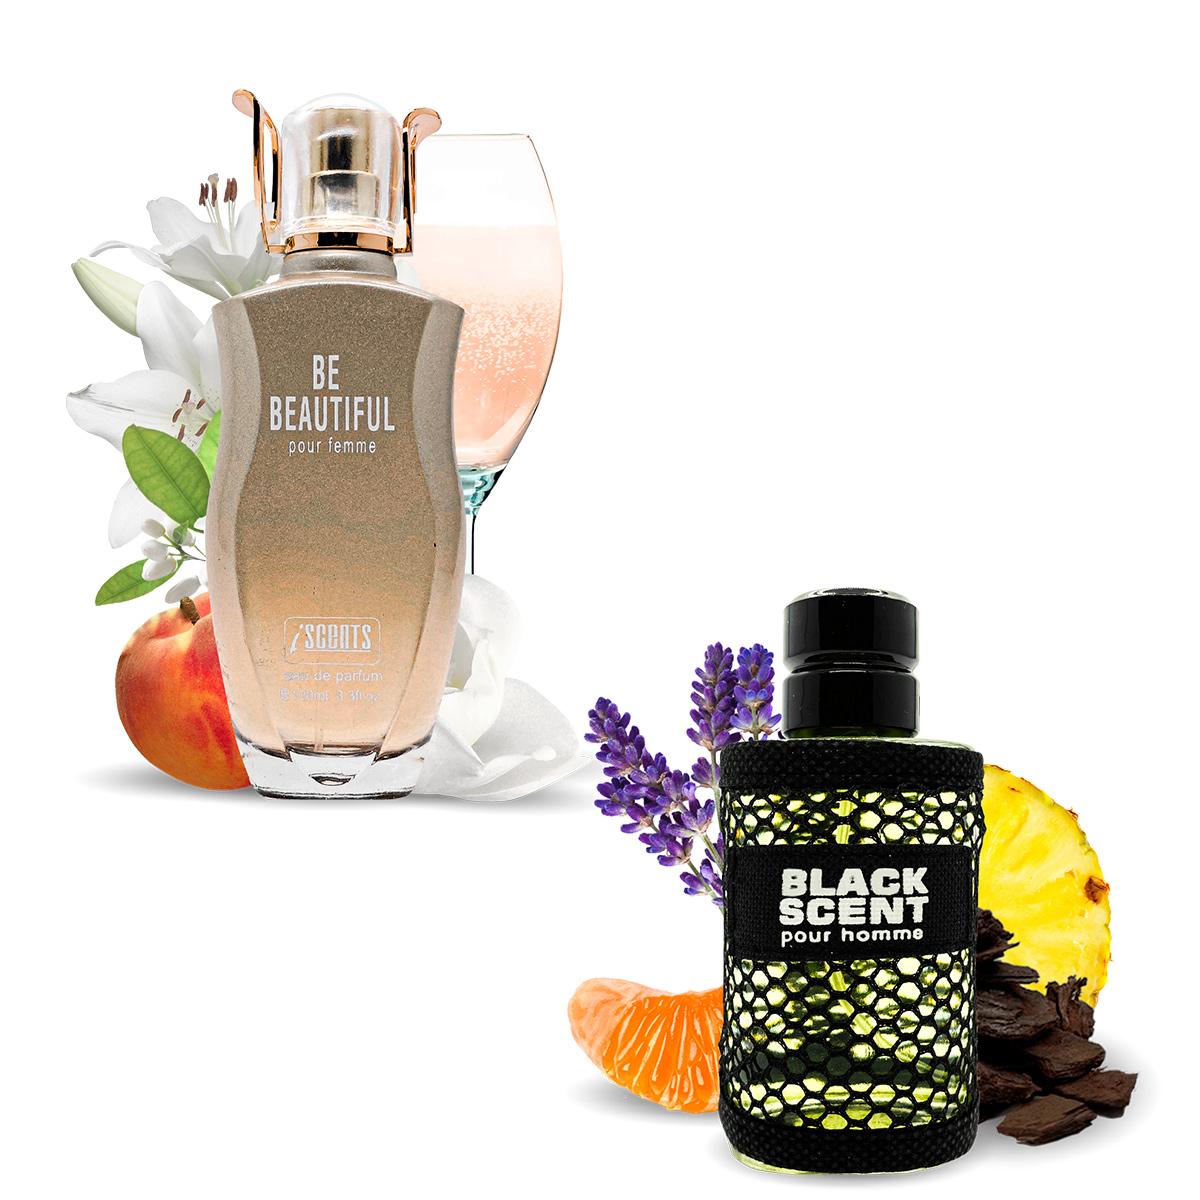 Kit 2 Perfumes Be Beautiful e Black Scent I Scents